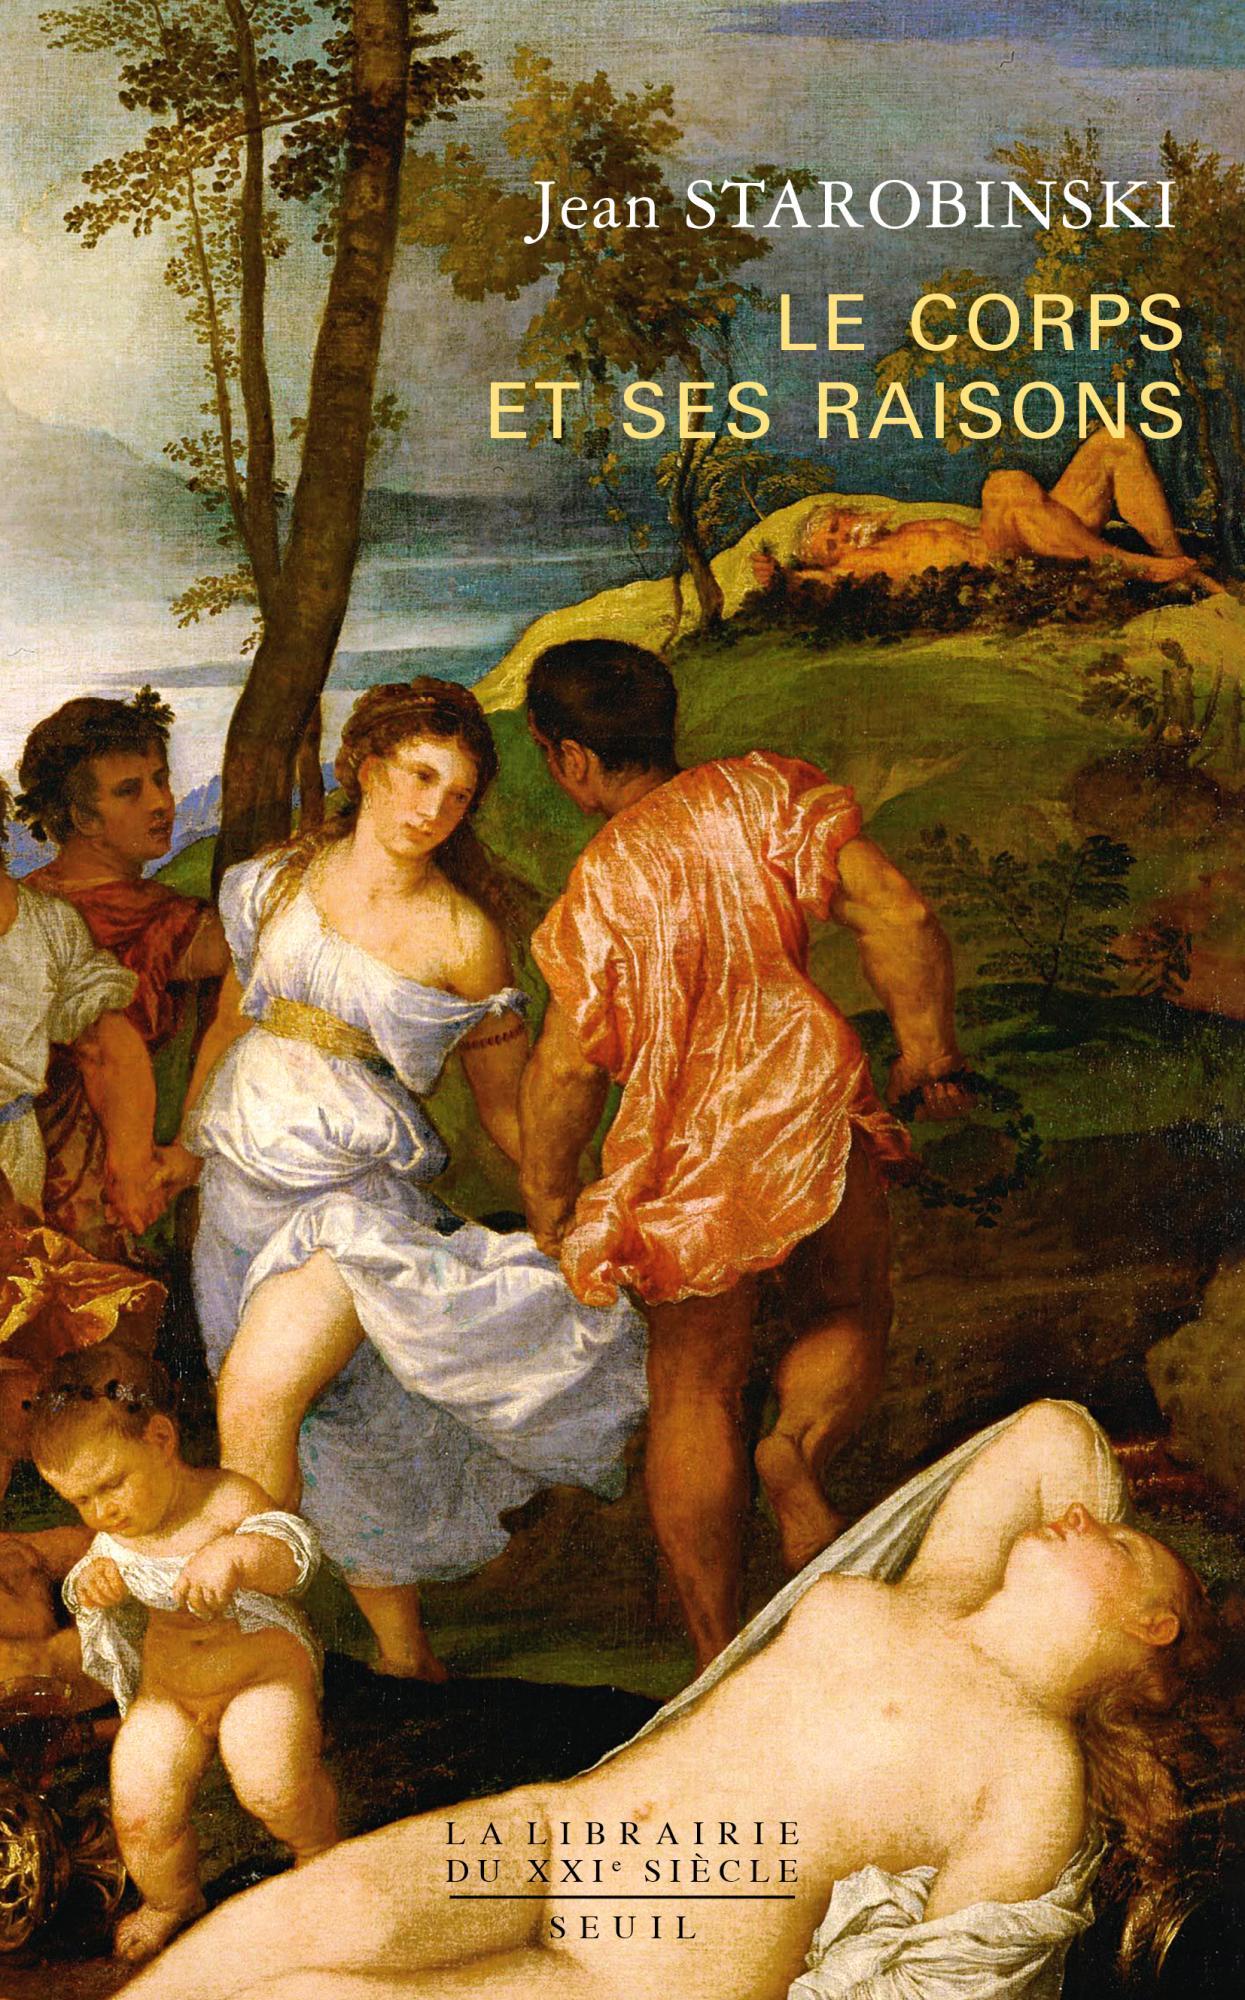 J. Starobinski, Le corps a ses raisons (éd. M. Rueff)